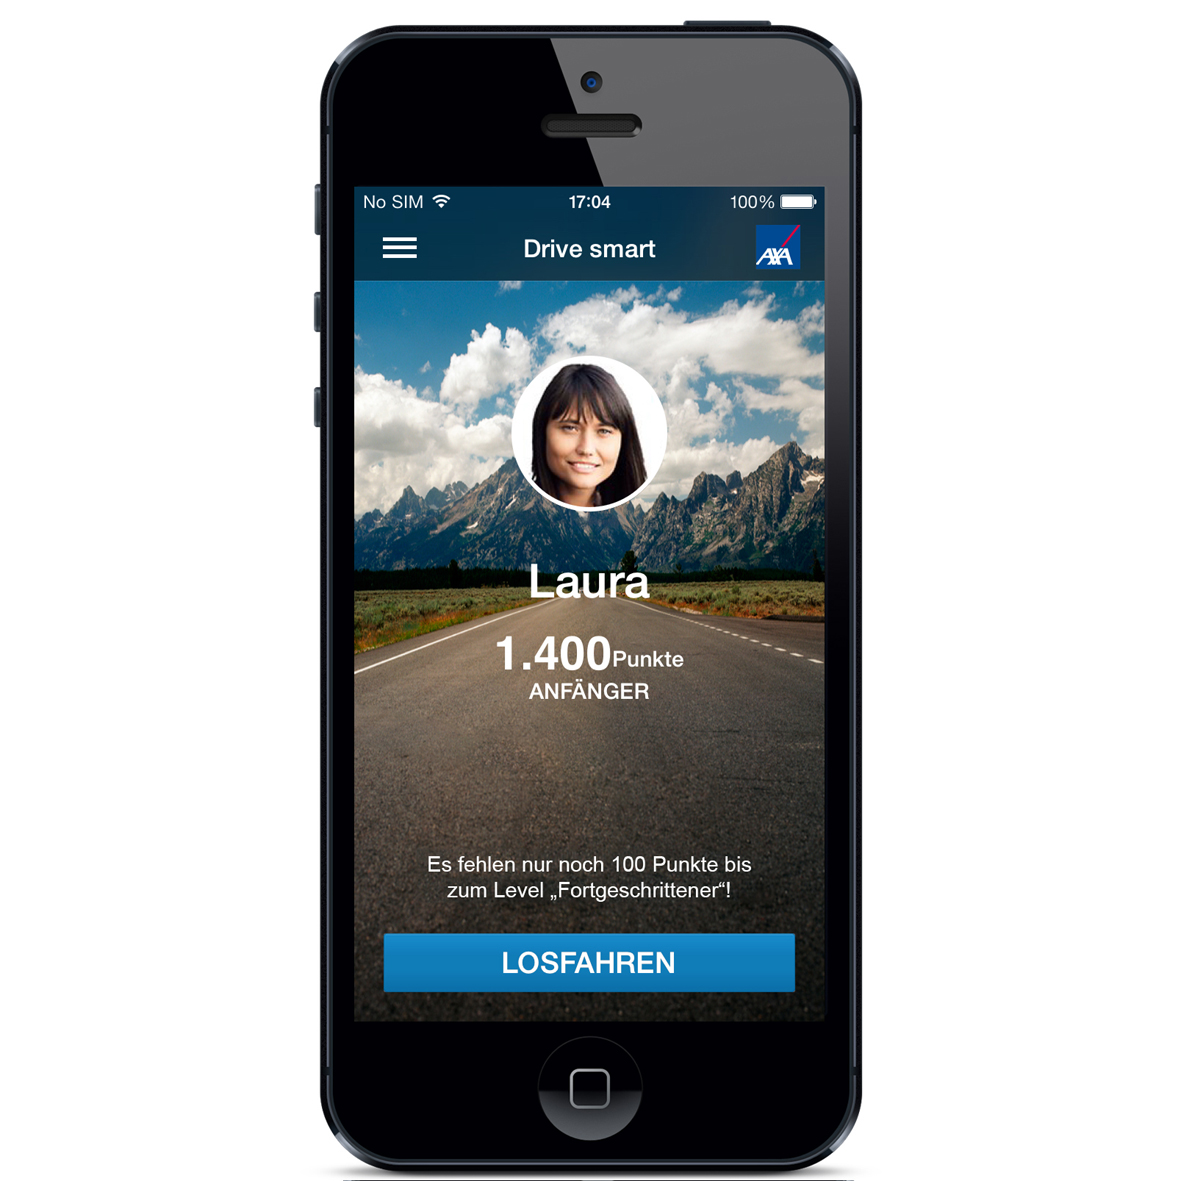 Smartphone-App als Fahrlehrer